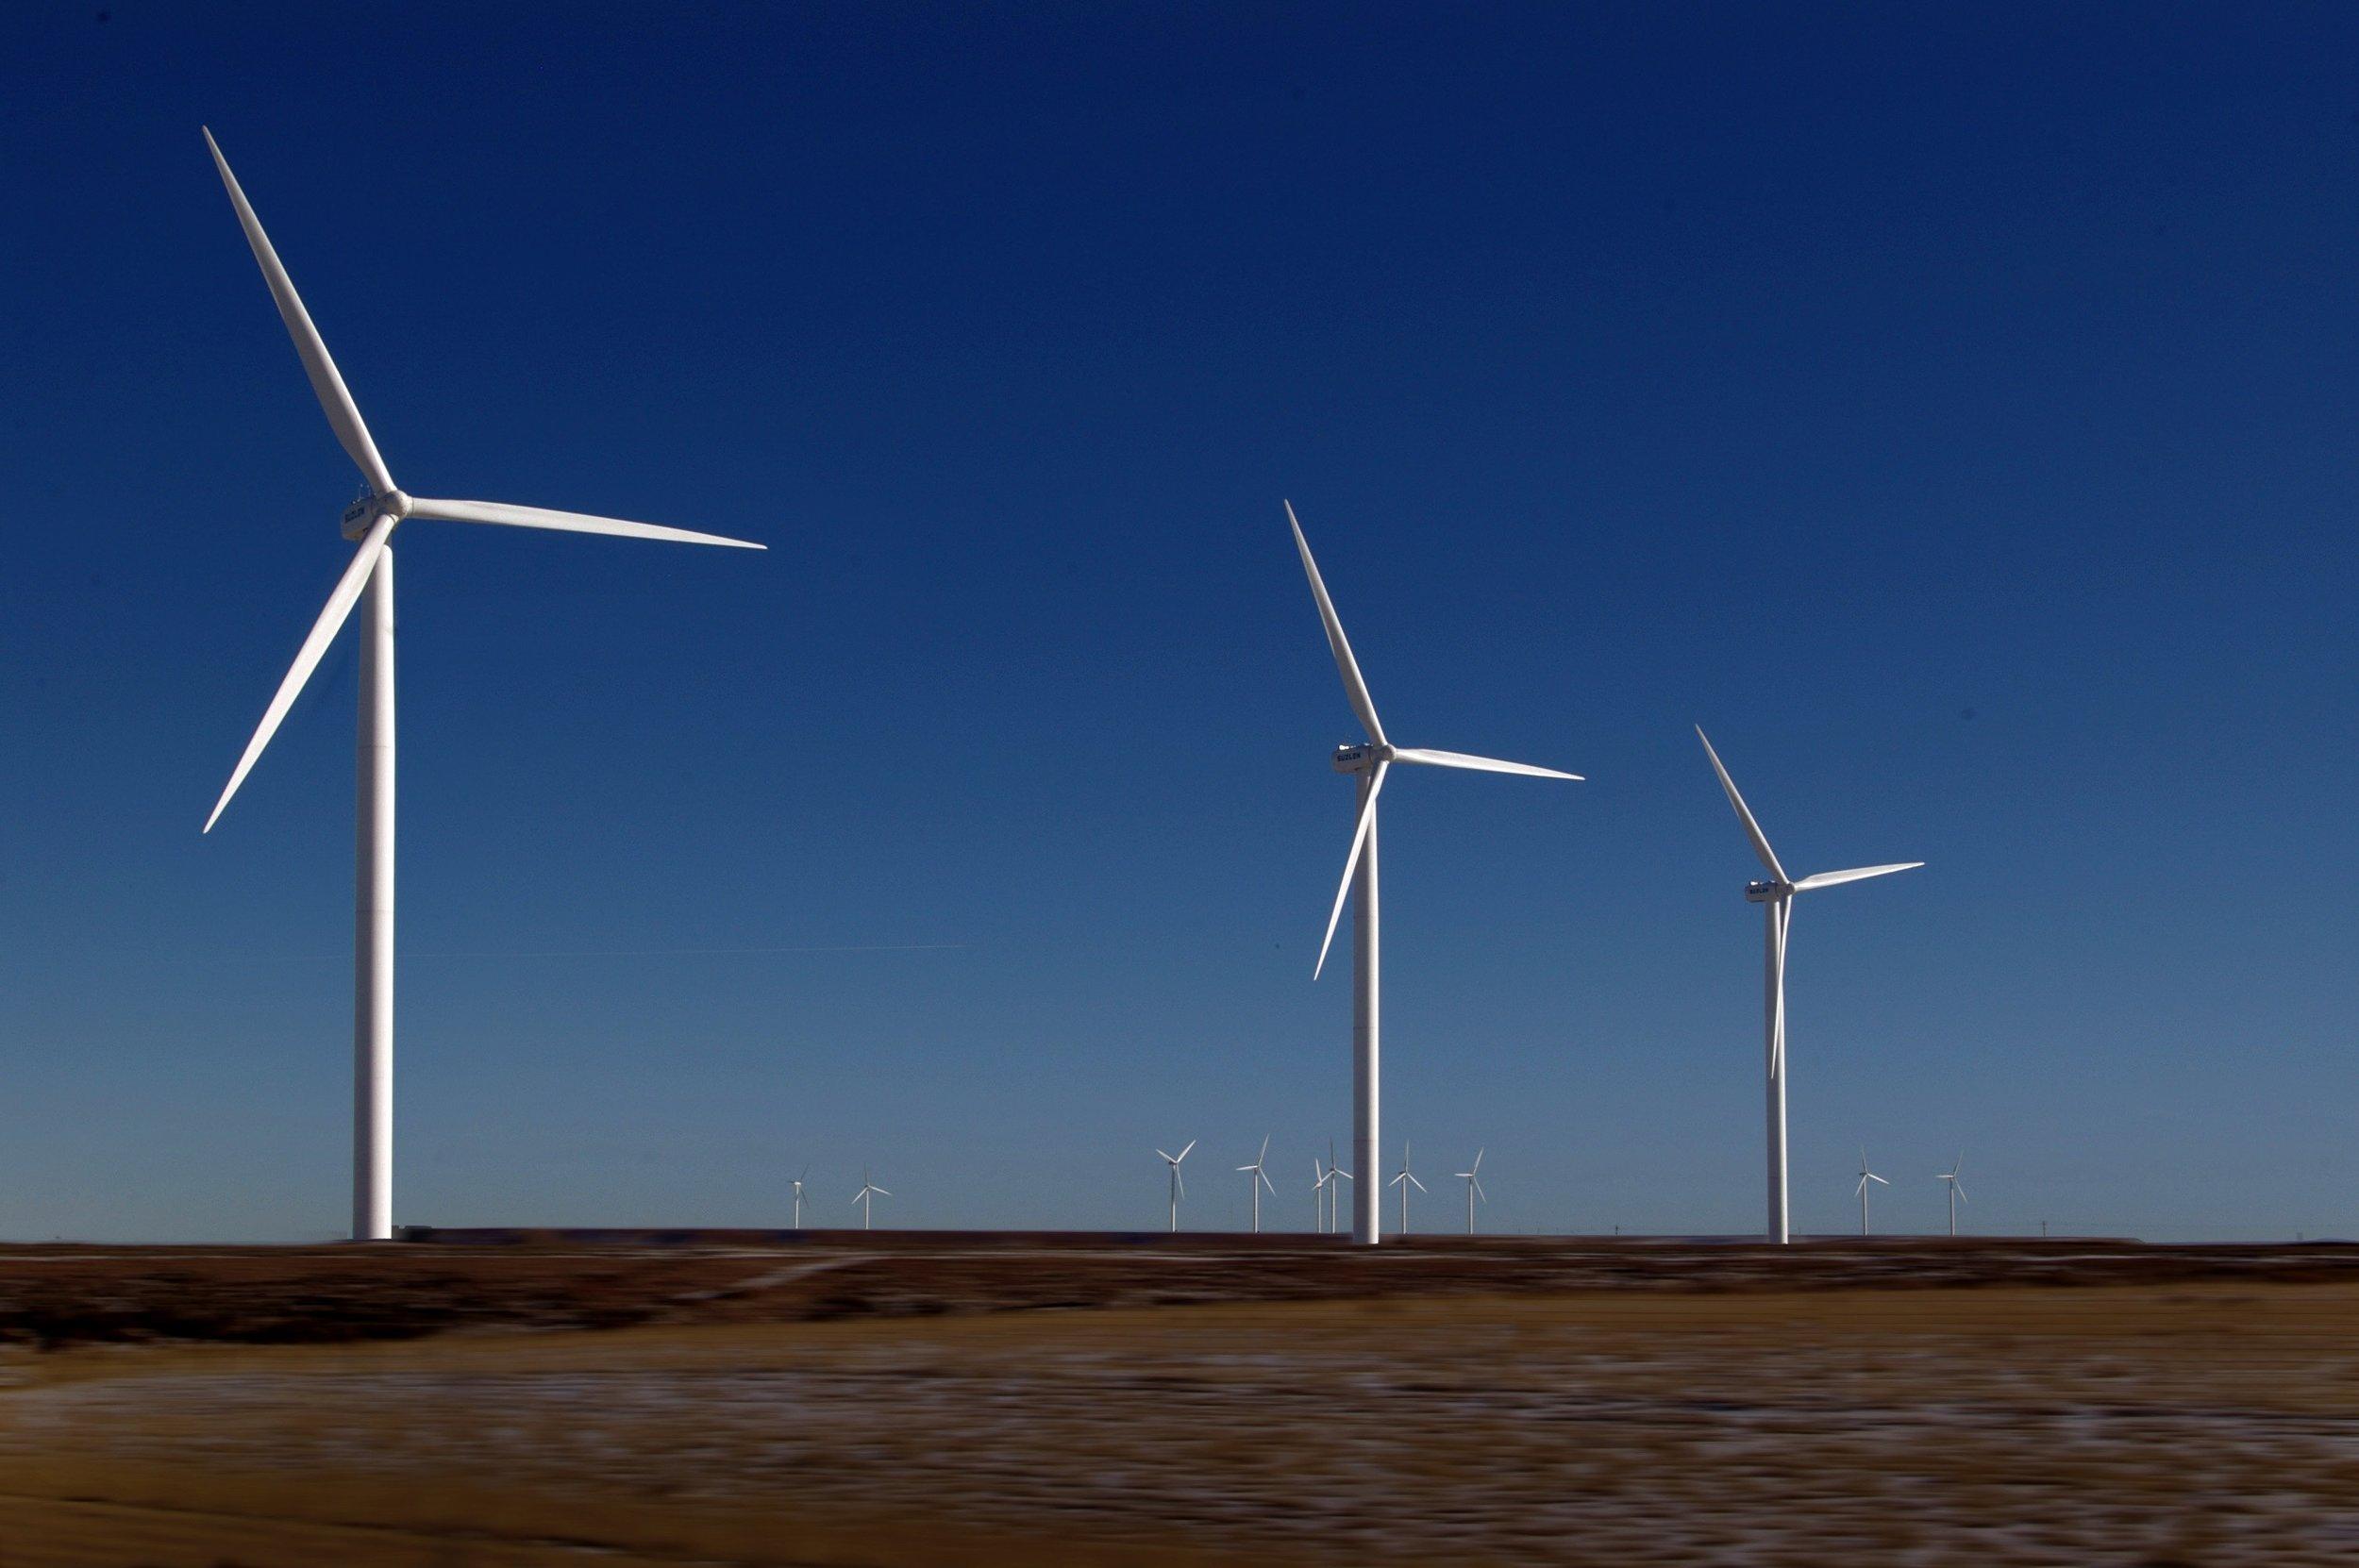 alternative-alternative-energy-blades-687854.jpg